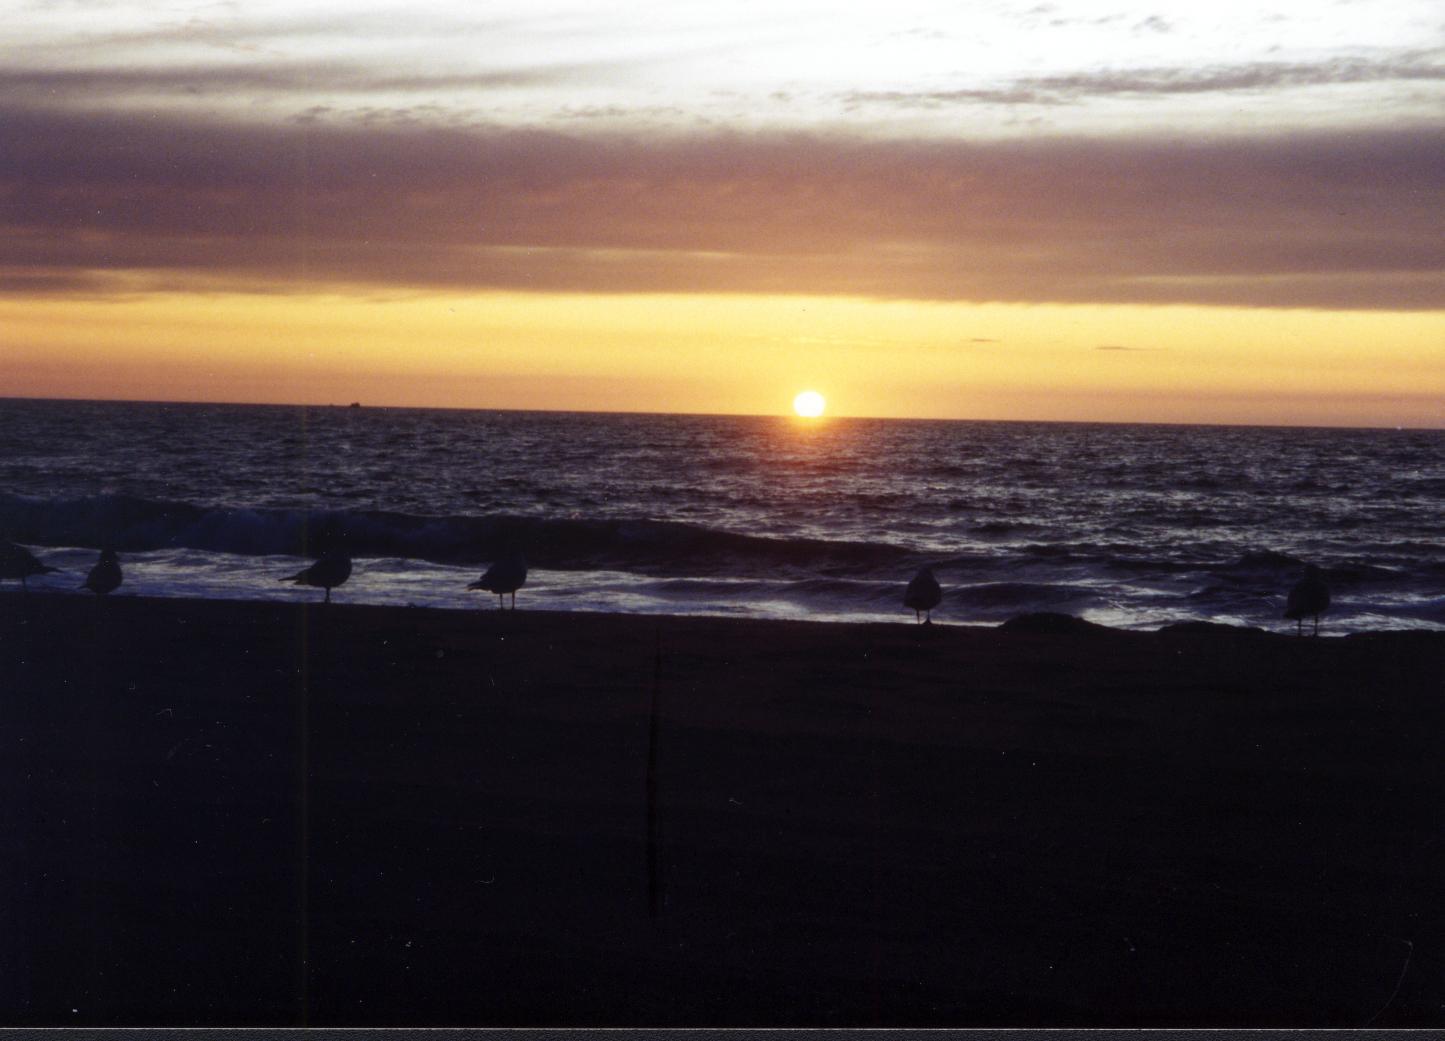 sea-gull-silhouette